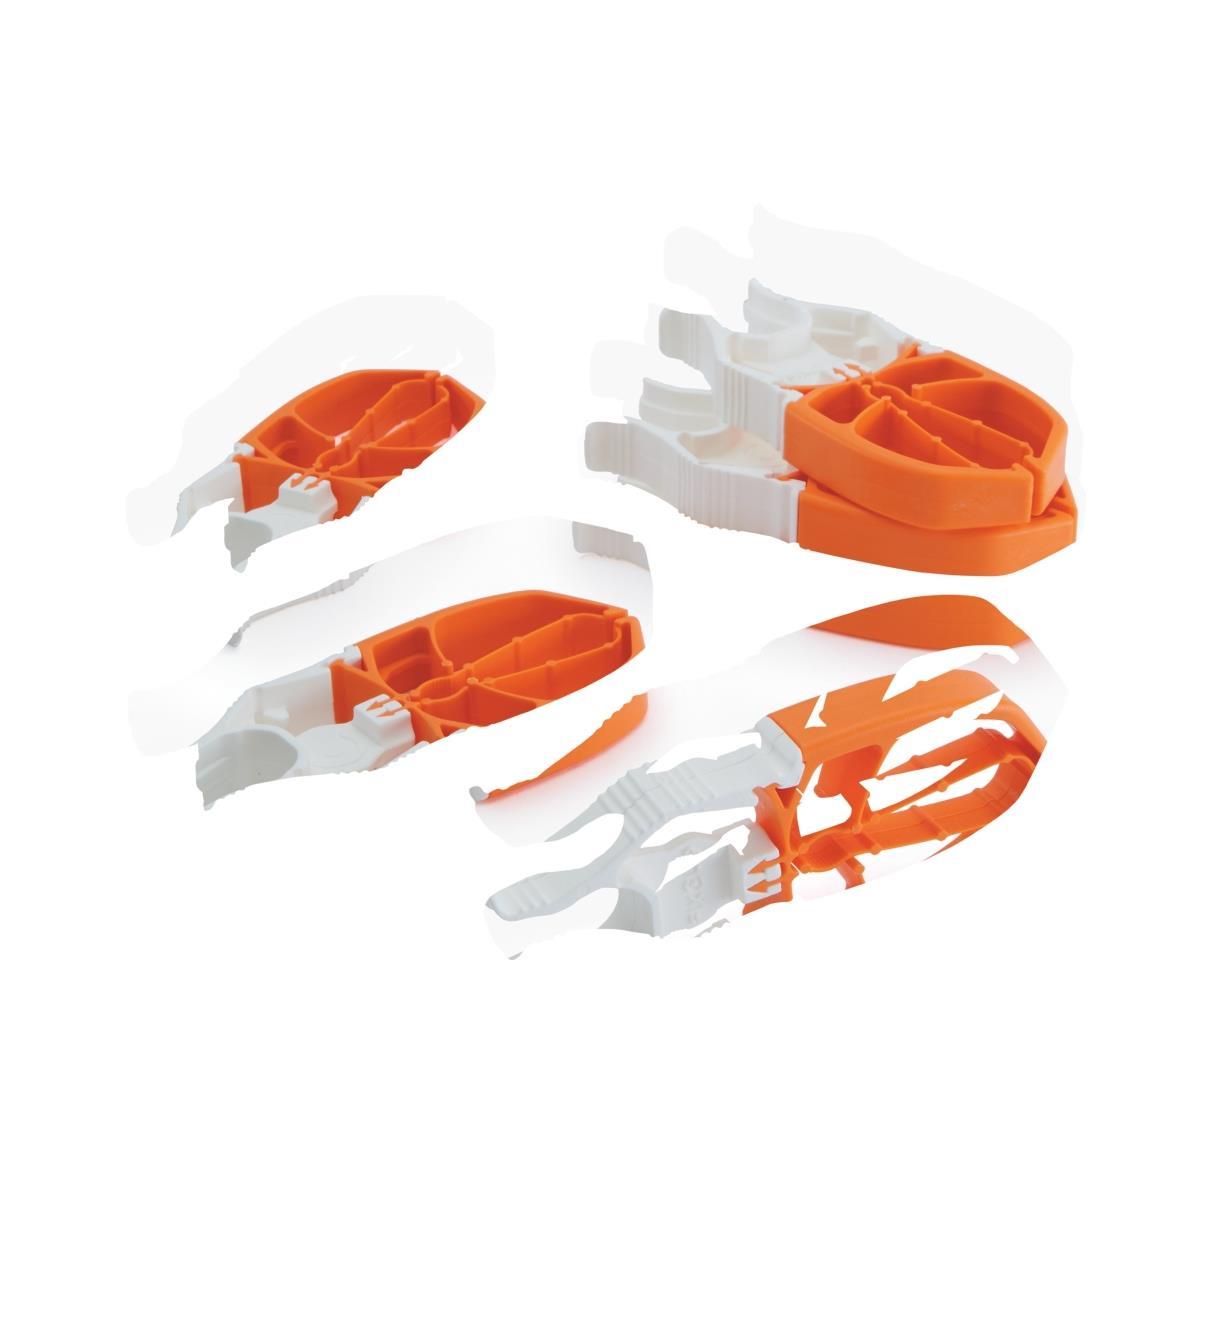 09A0216 - Pinces à linge FixClip, lepaquetde6